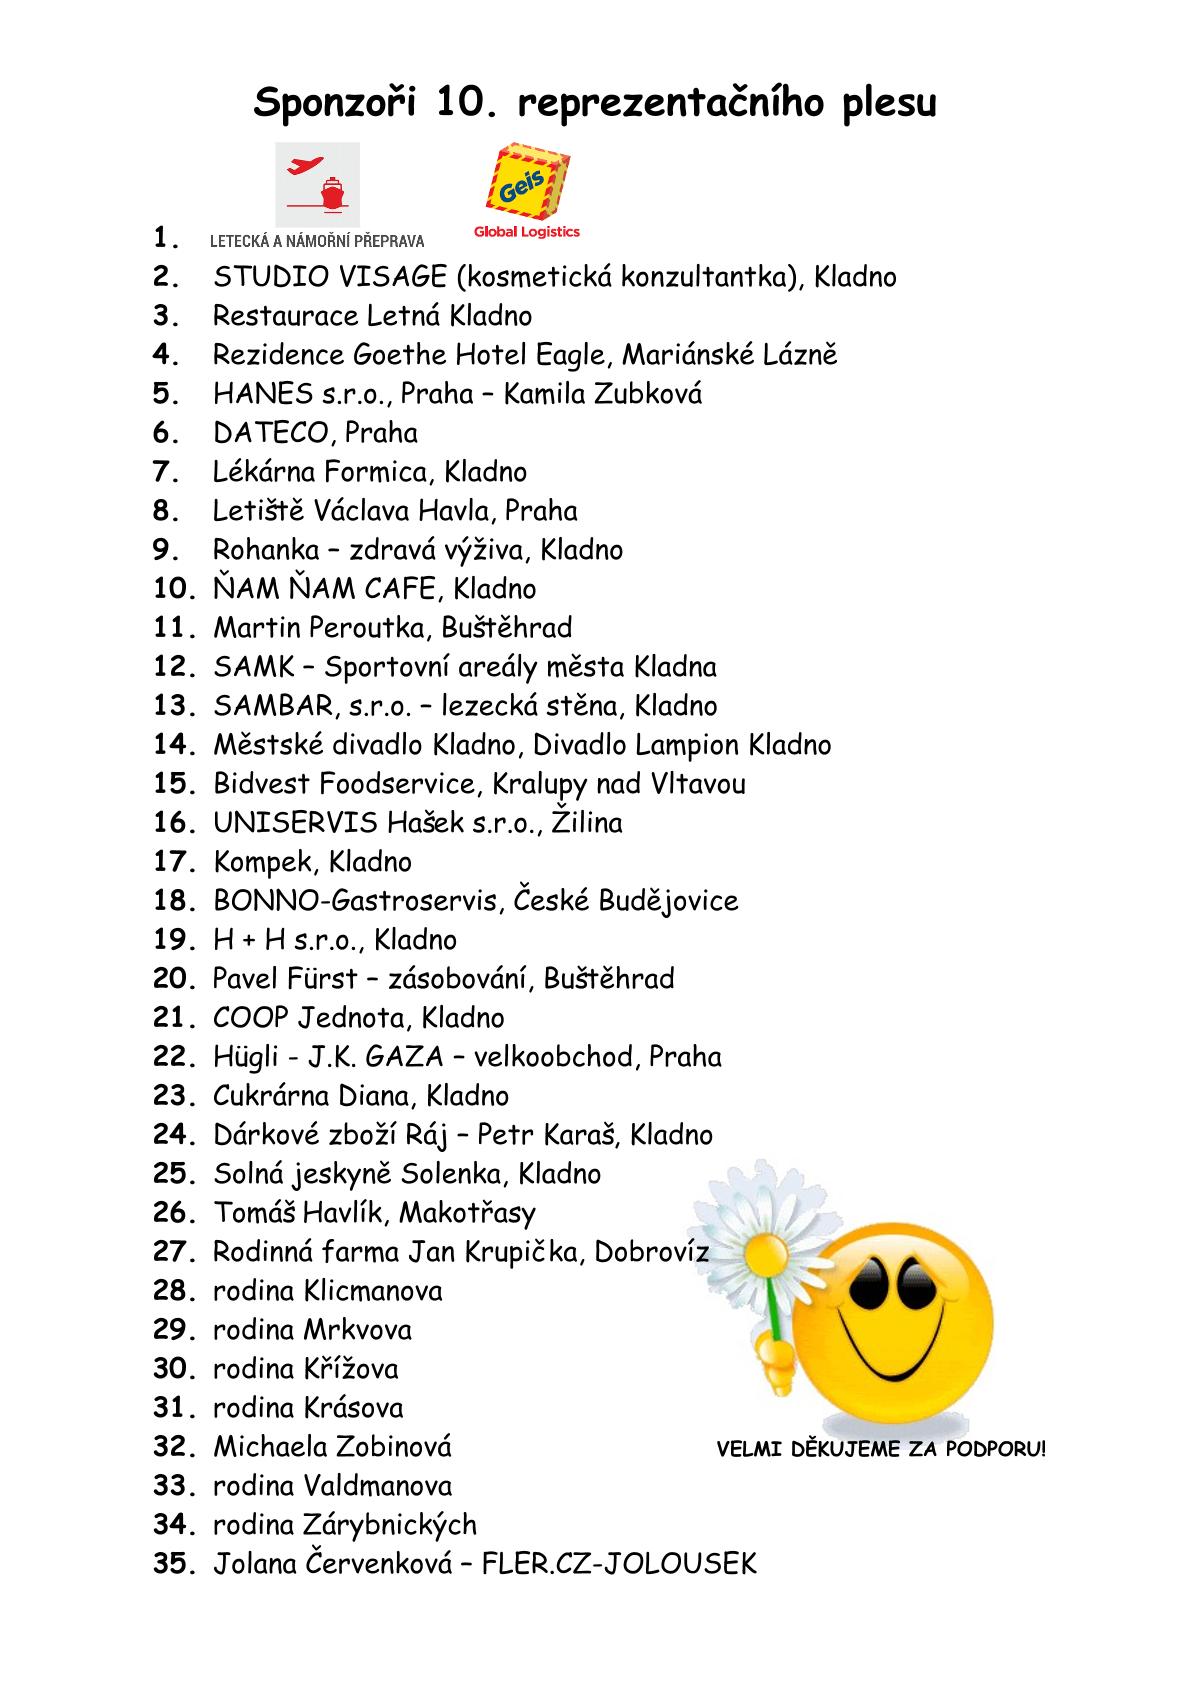 20190320 Sponzoři 10 seznam